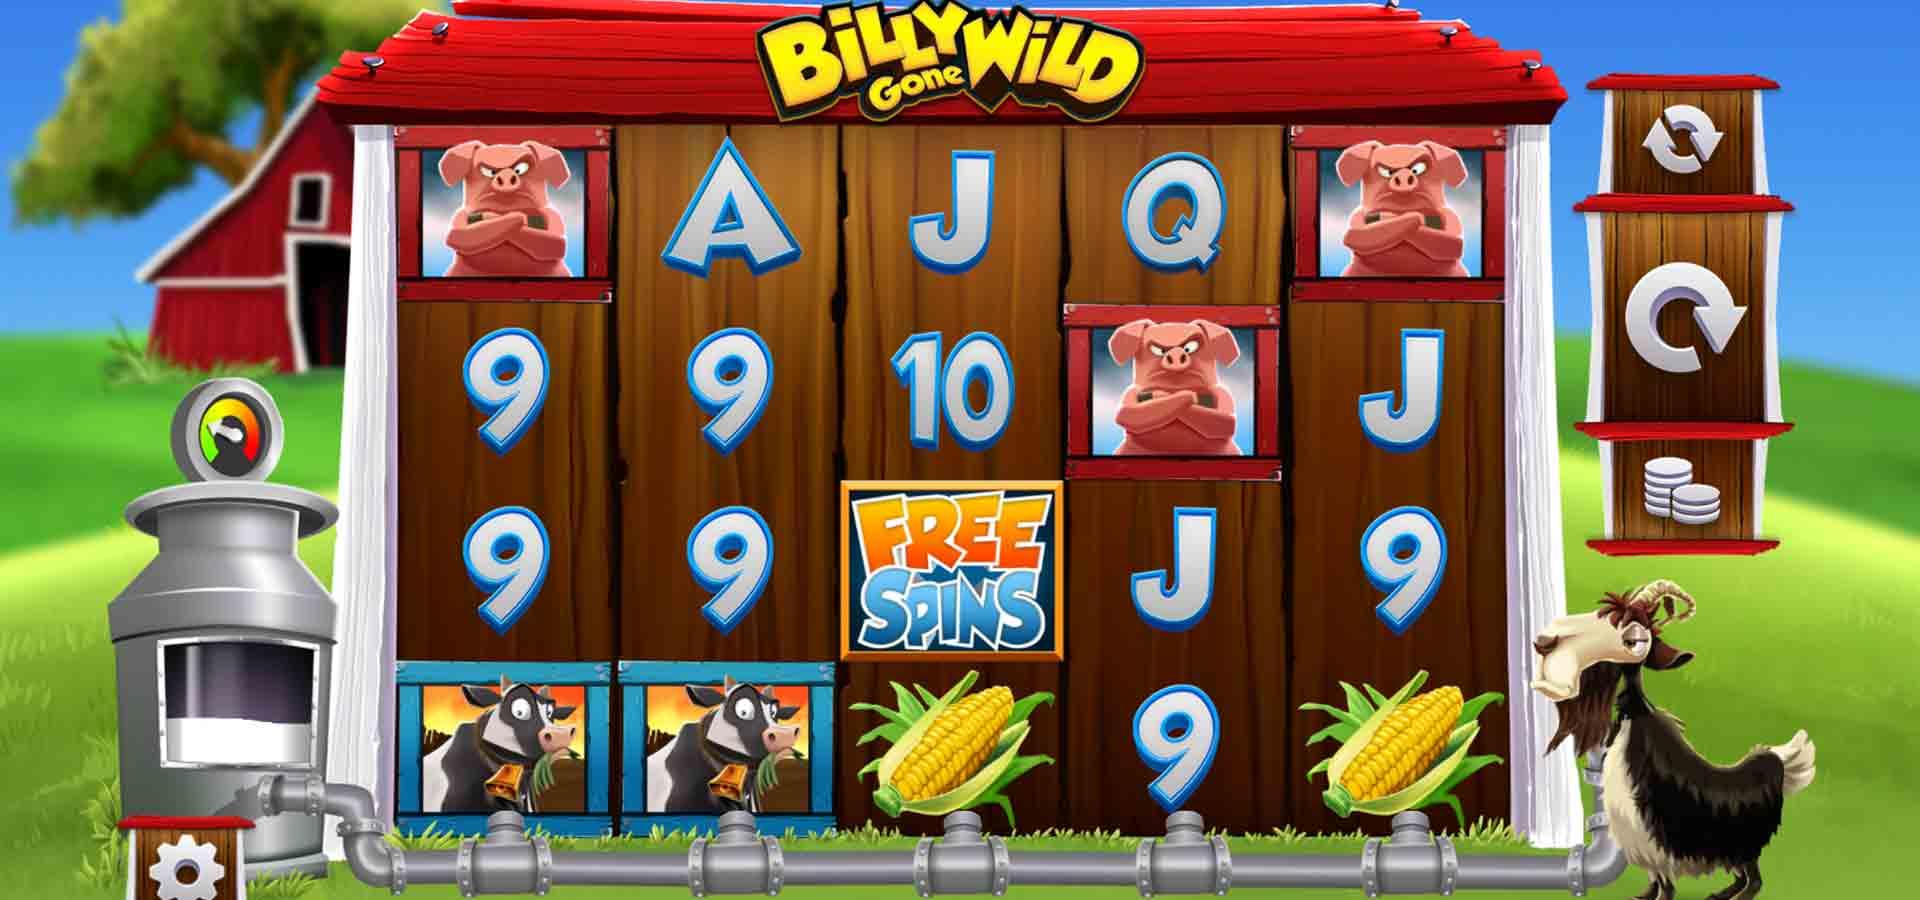 Billy Gone Wild Slots Game